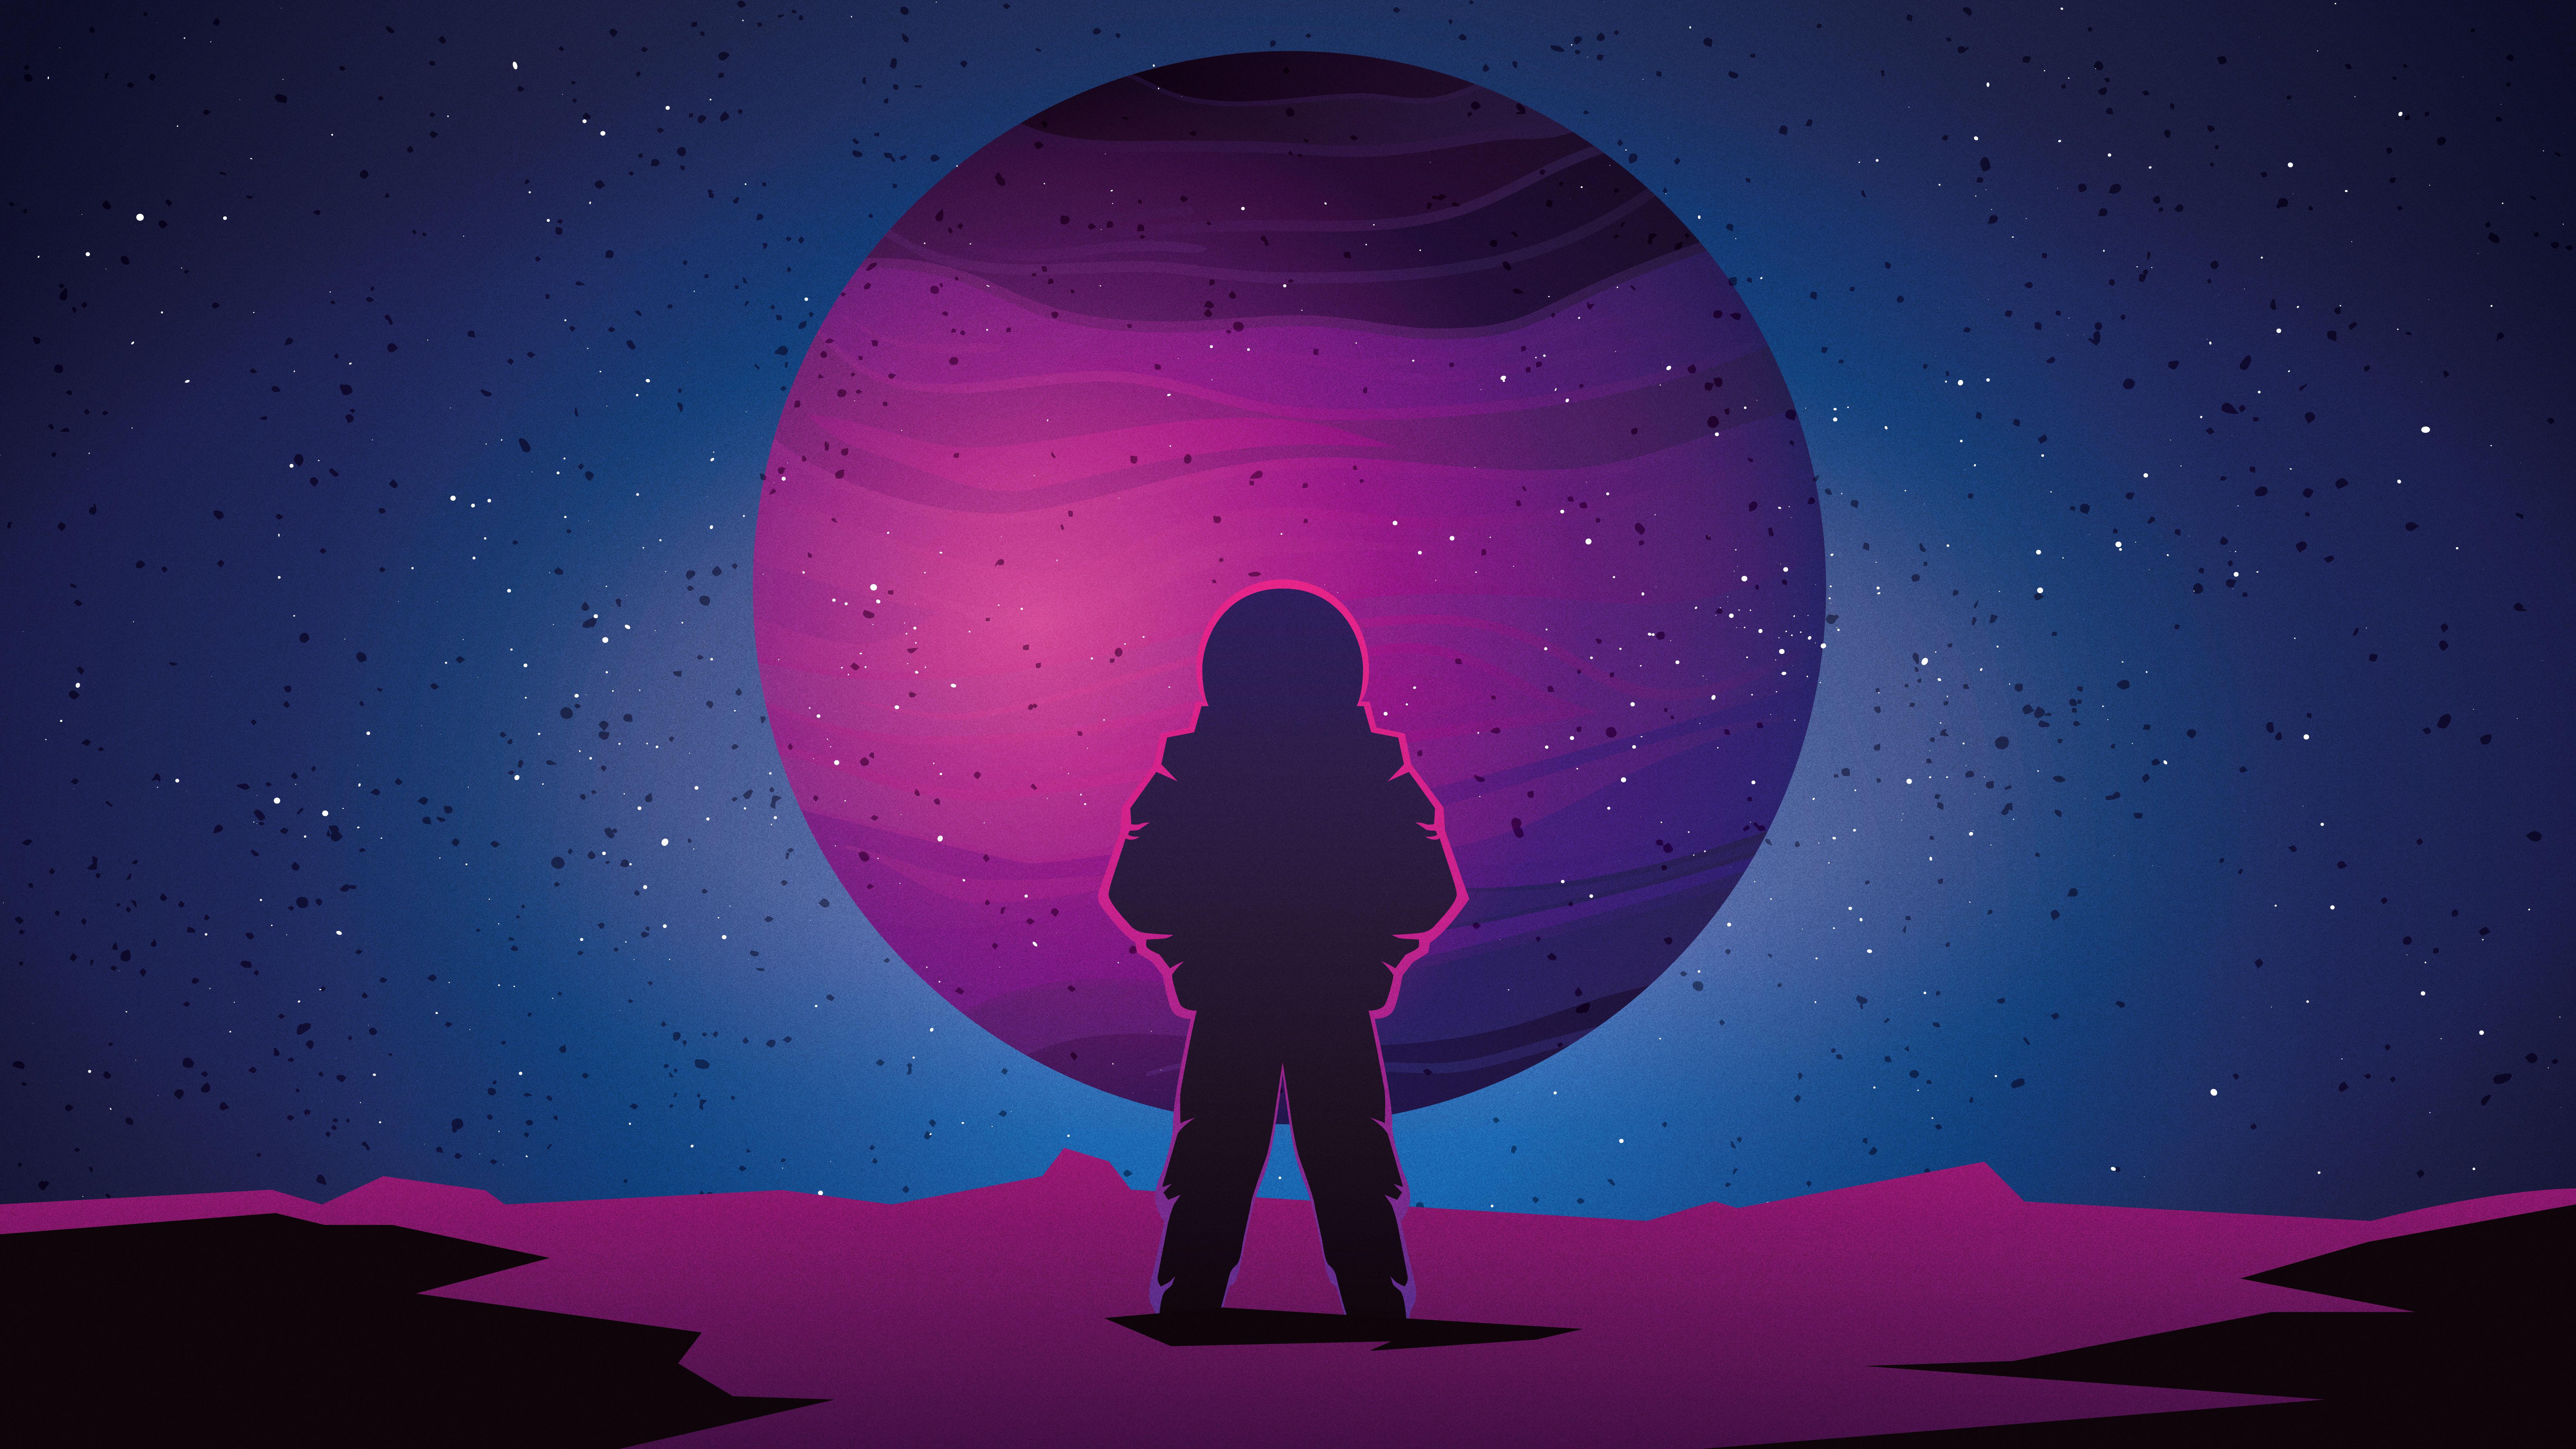 Astronaut Minimalist, HD Artist, 4k